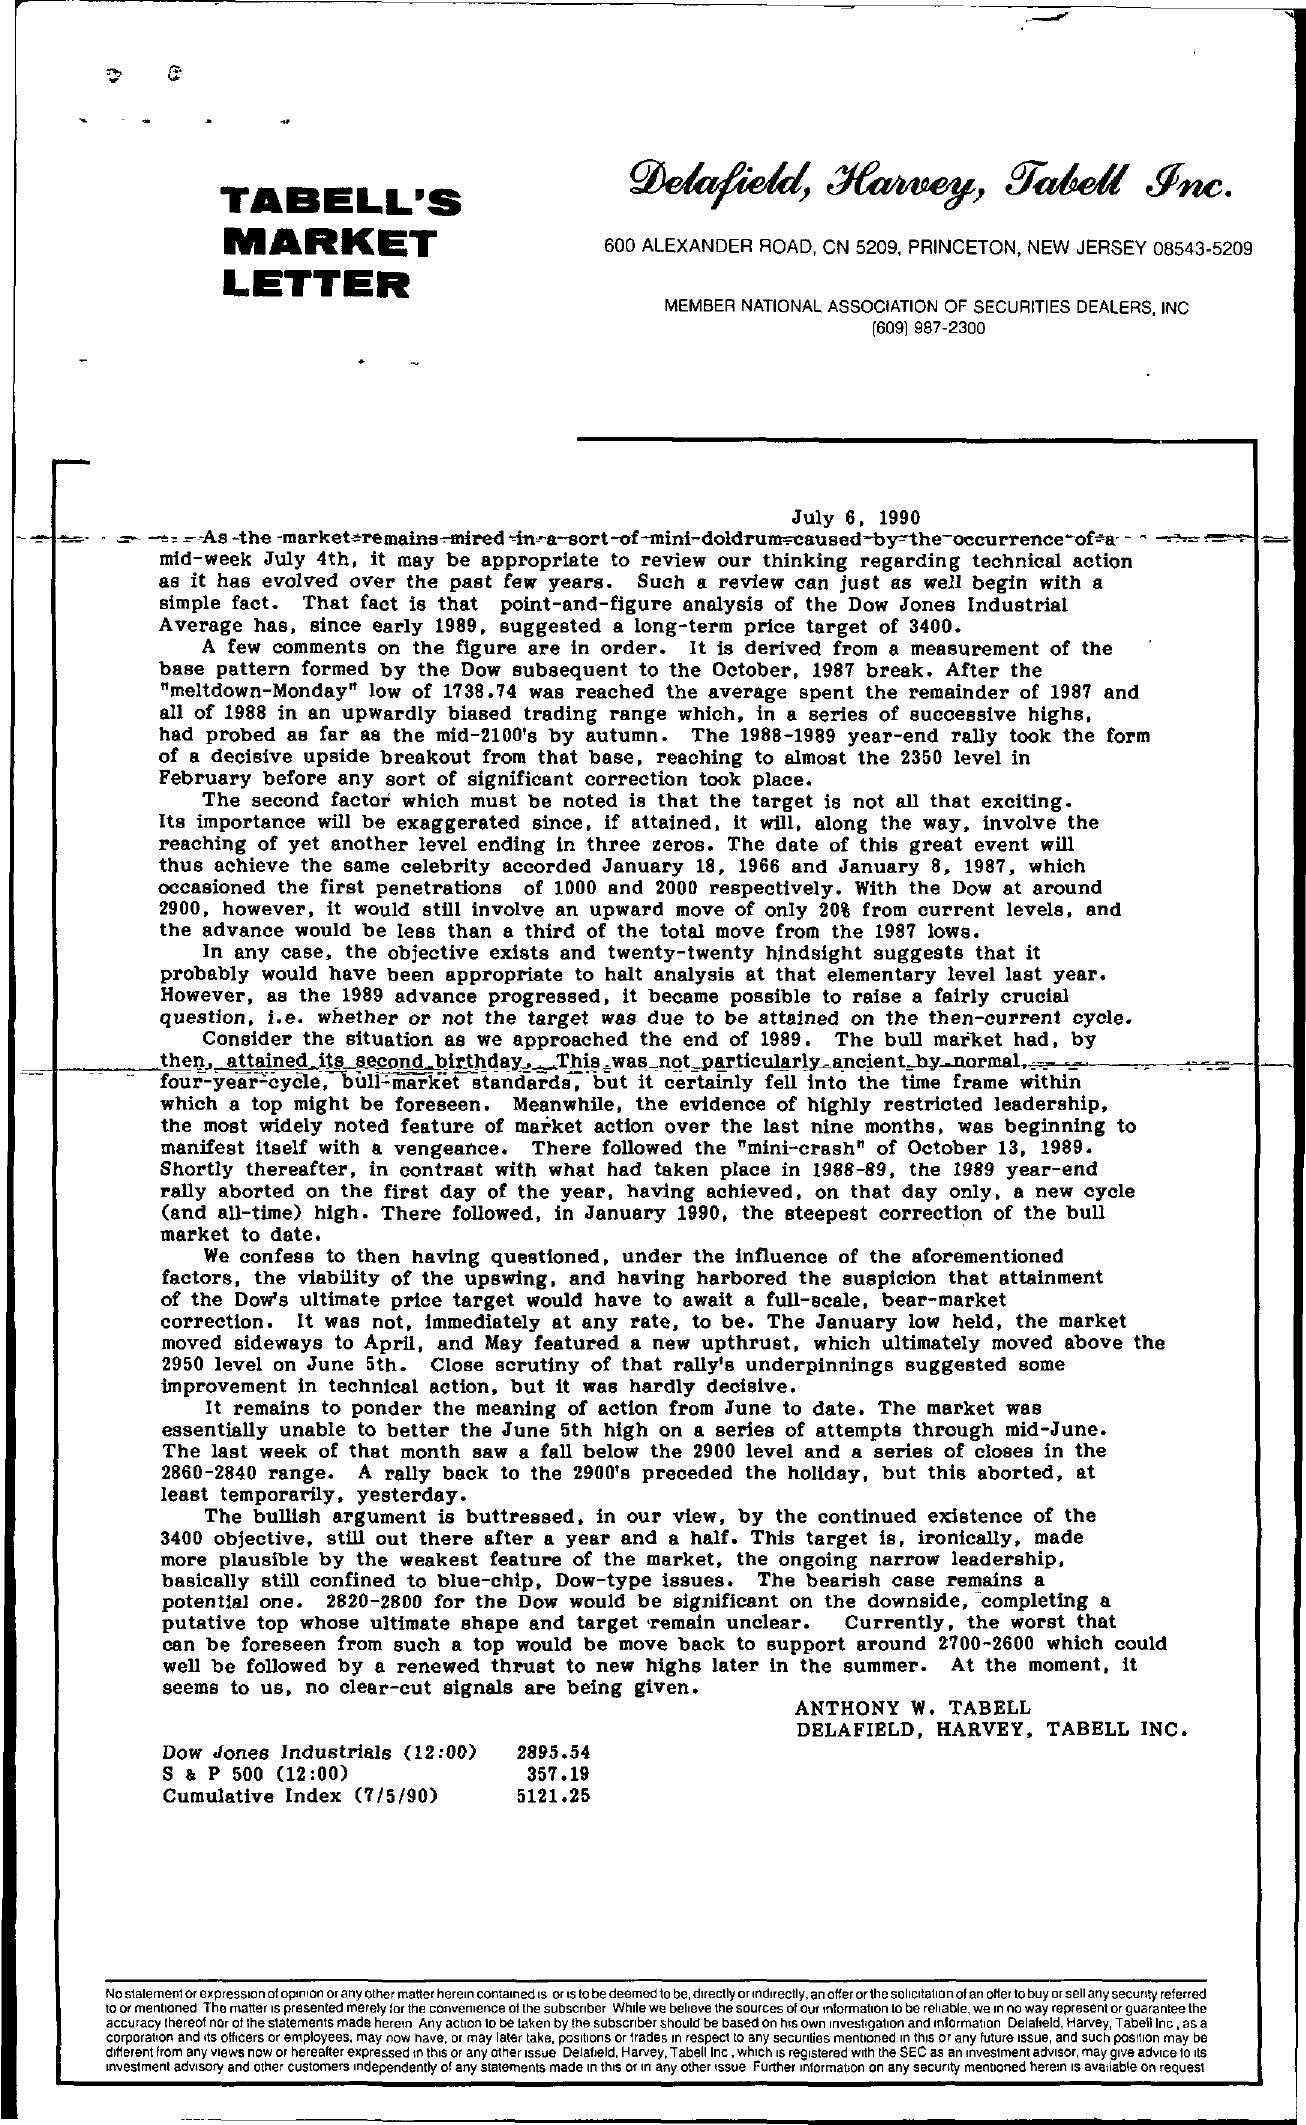 Tabell's Market Letter - July 06, 1990